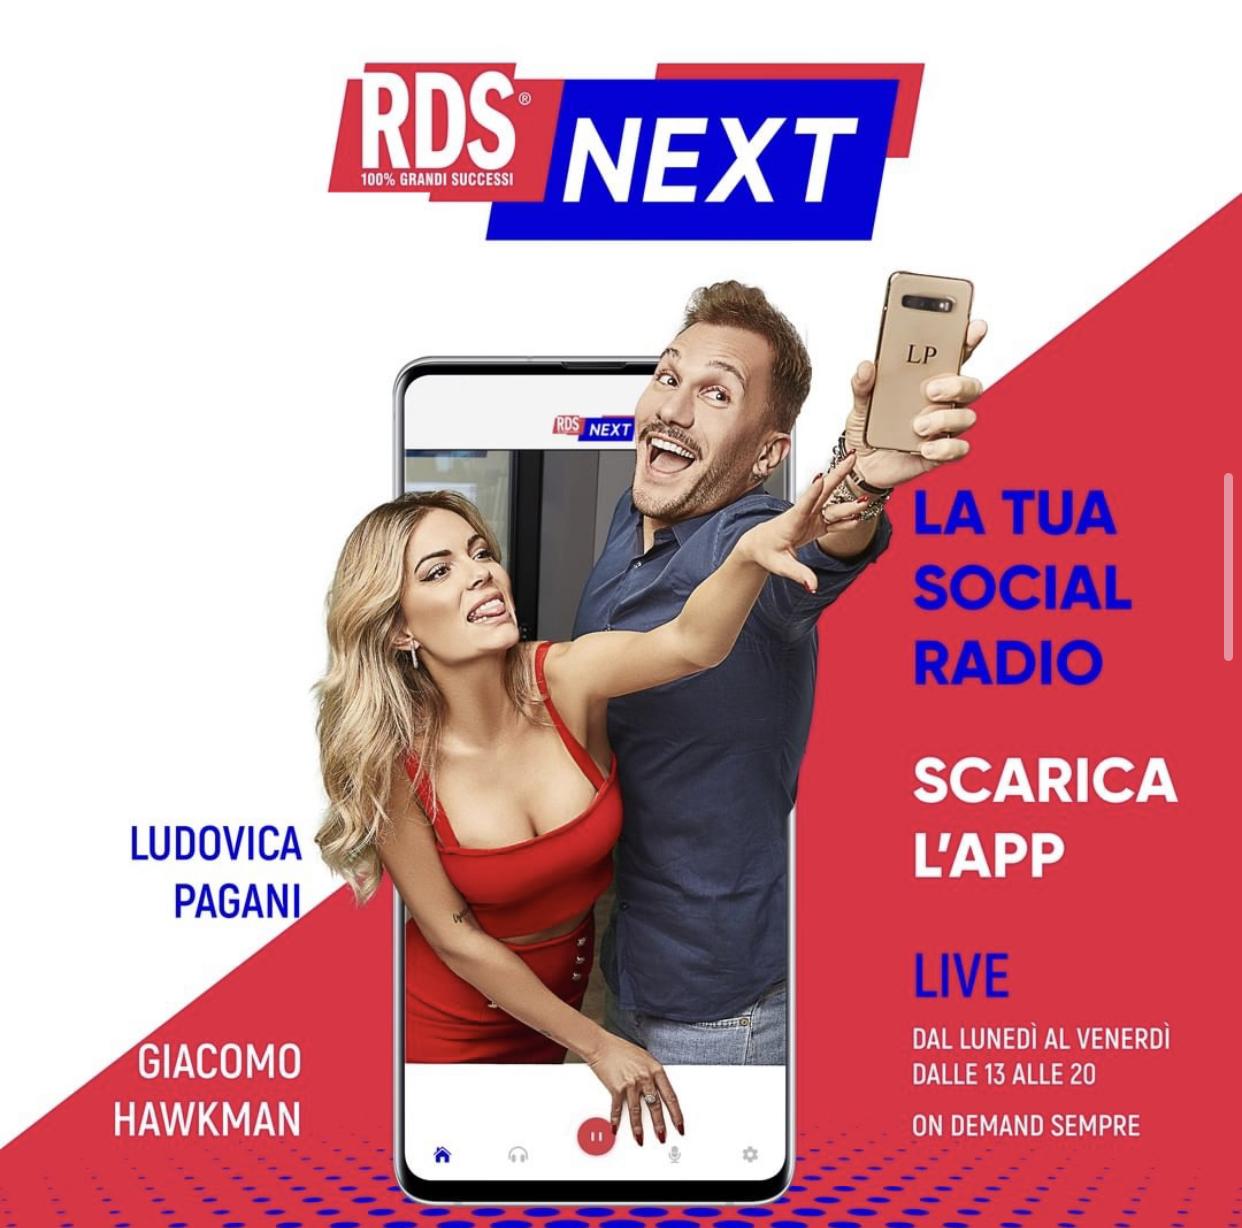 RDS NEXT - LUDOVICA PAGANI GIACOMO HAWKMAN